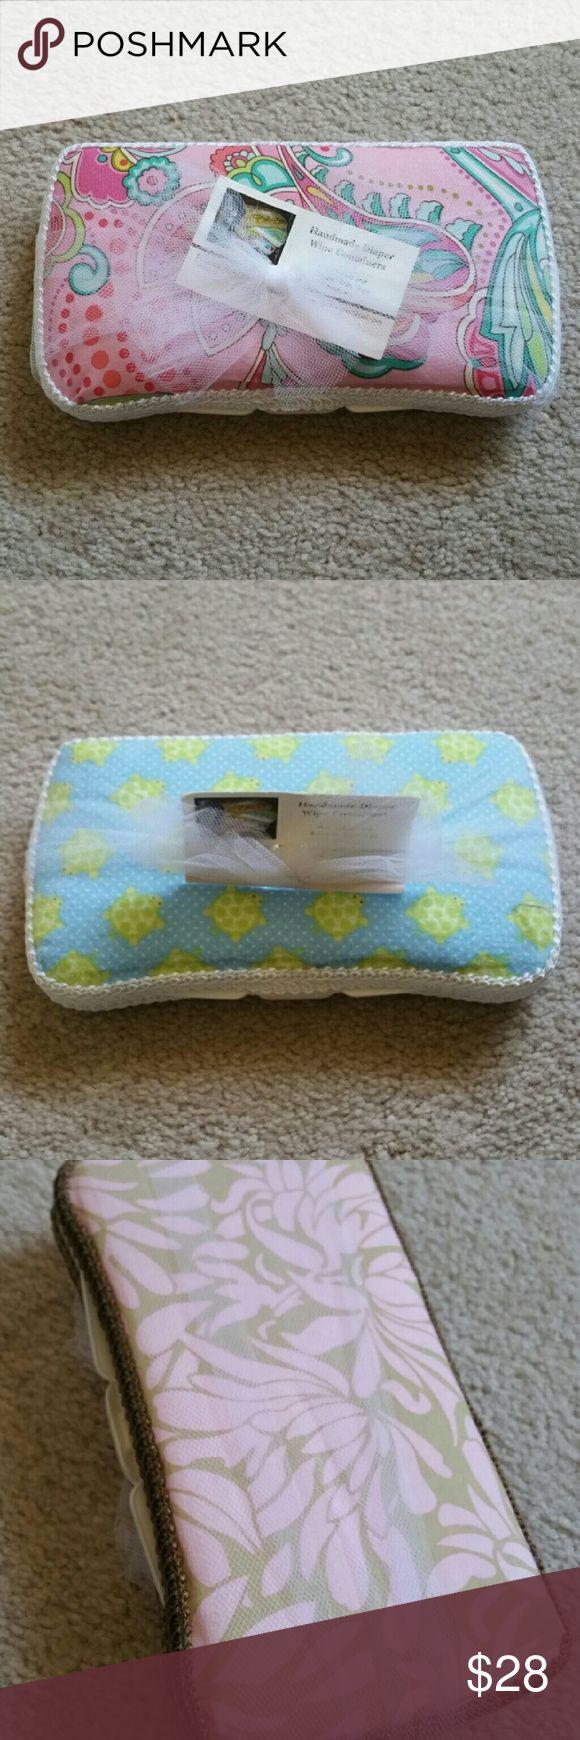 Custom wet wipe case New and handmade. Smoke free home. Other